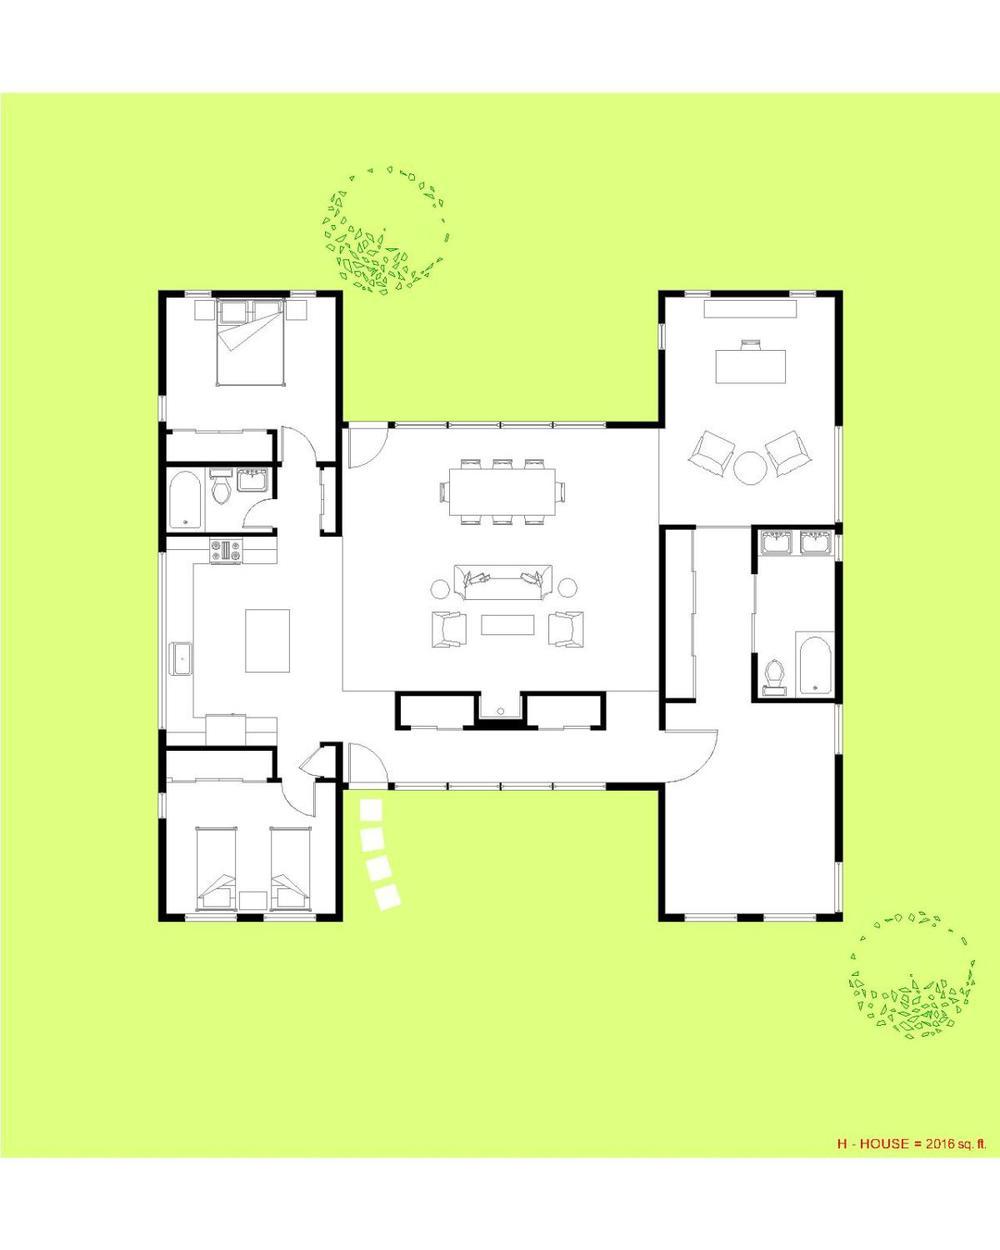 Trillium Architects H House 1 Story Modern Floor Plan Design Inspirations